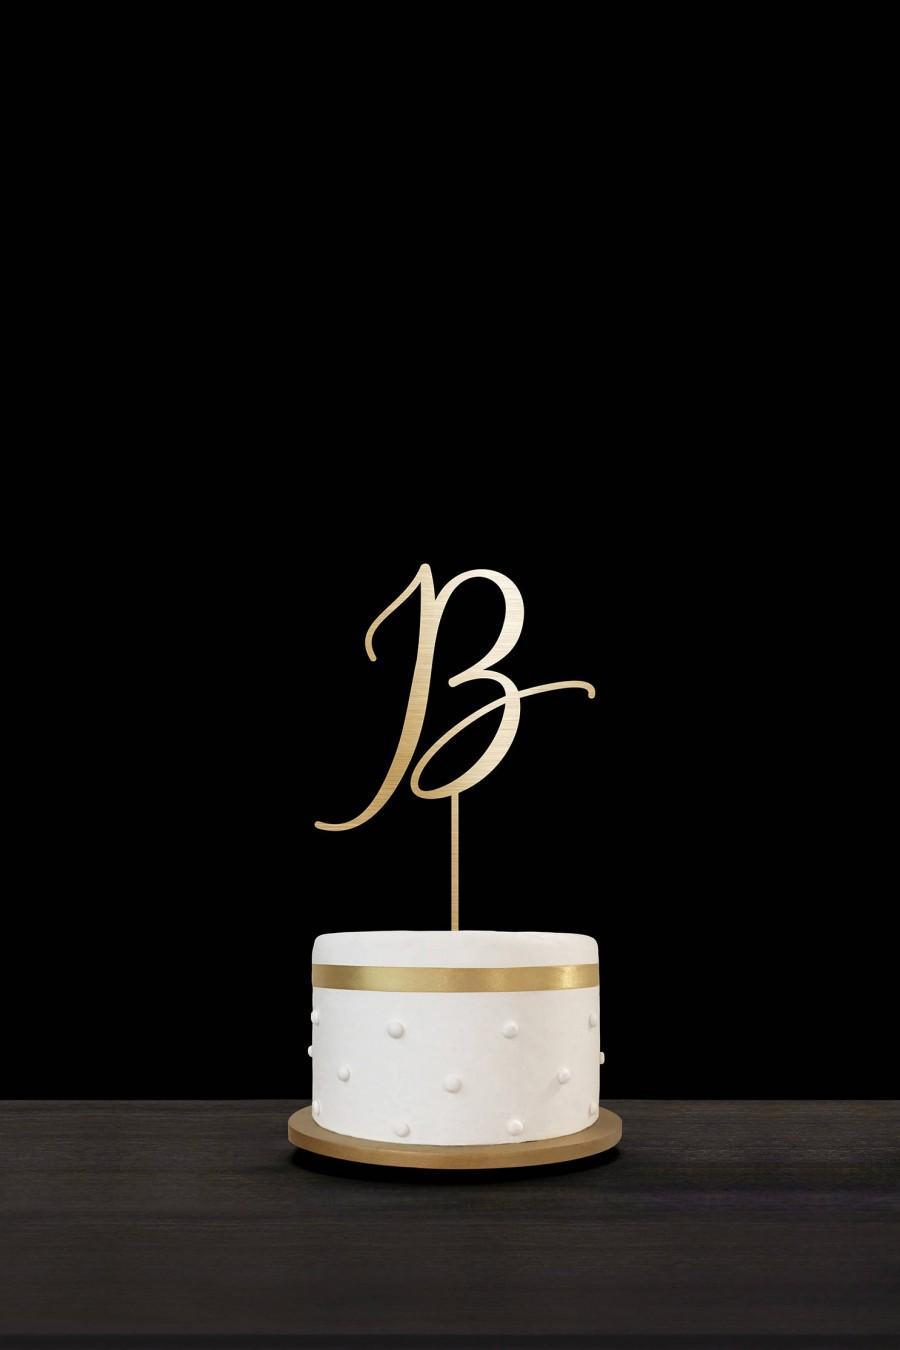 Hochzeit - Customized Wedding Cake Topper Personalized Cake Topper for Wedding, Custom Personalized Wedding Cake Topper, Monogram Cake Topper #26